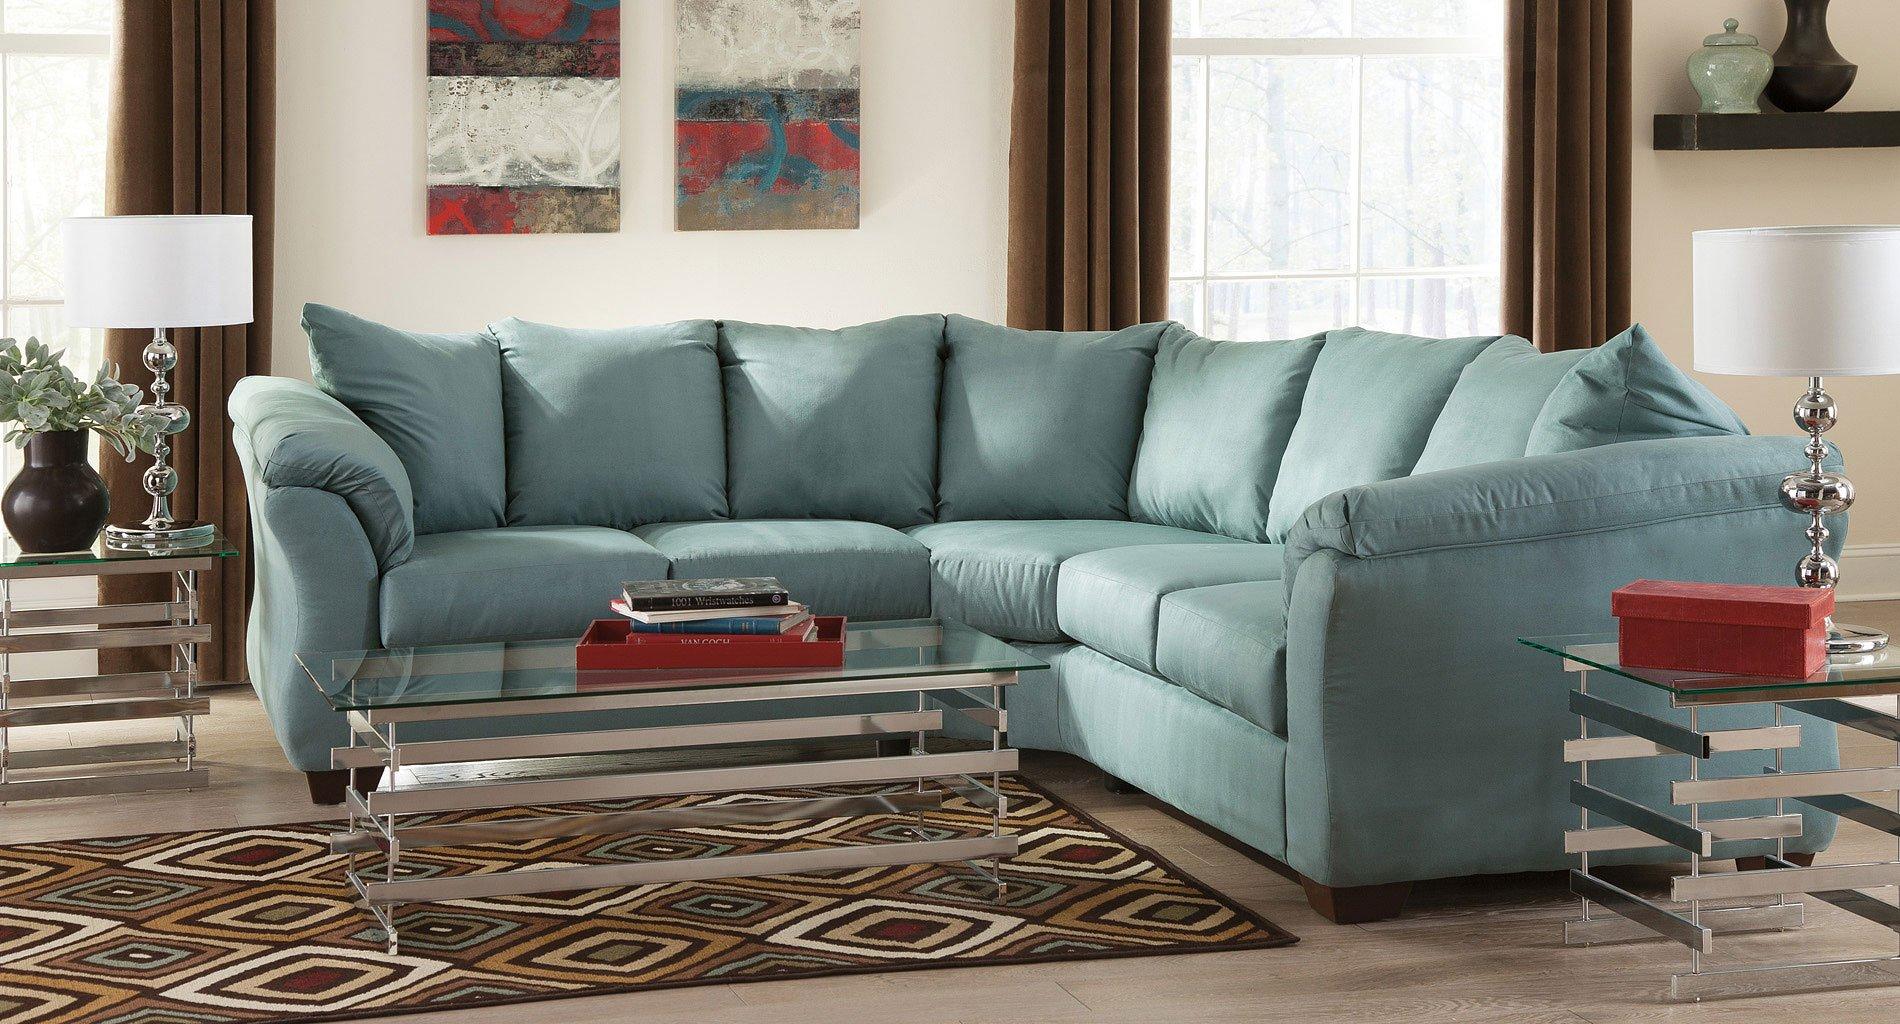 darcy sky sectional living room set by signature design by ashley furniturepick. Black Bedroom Furniture Sets. Home Design Ideas